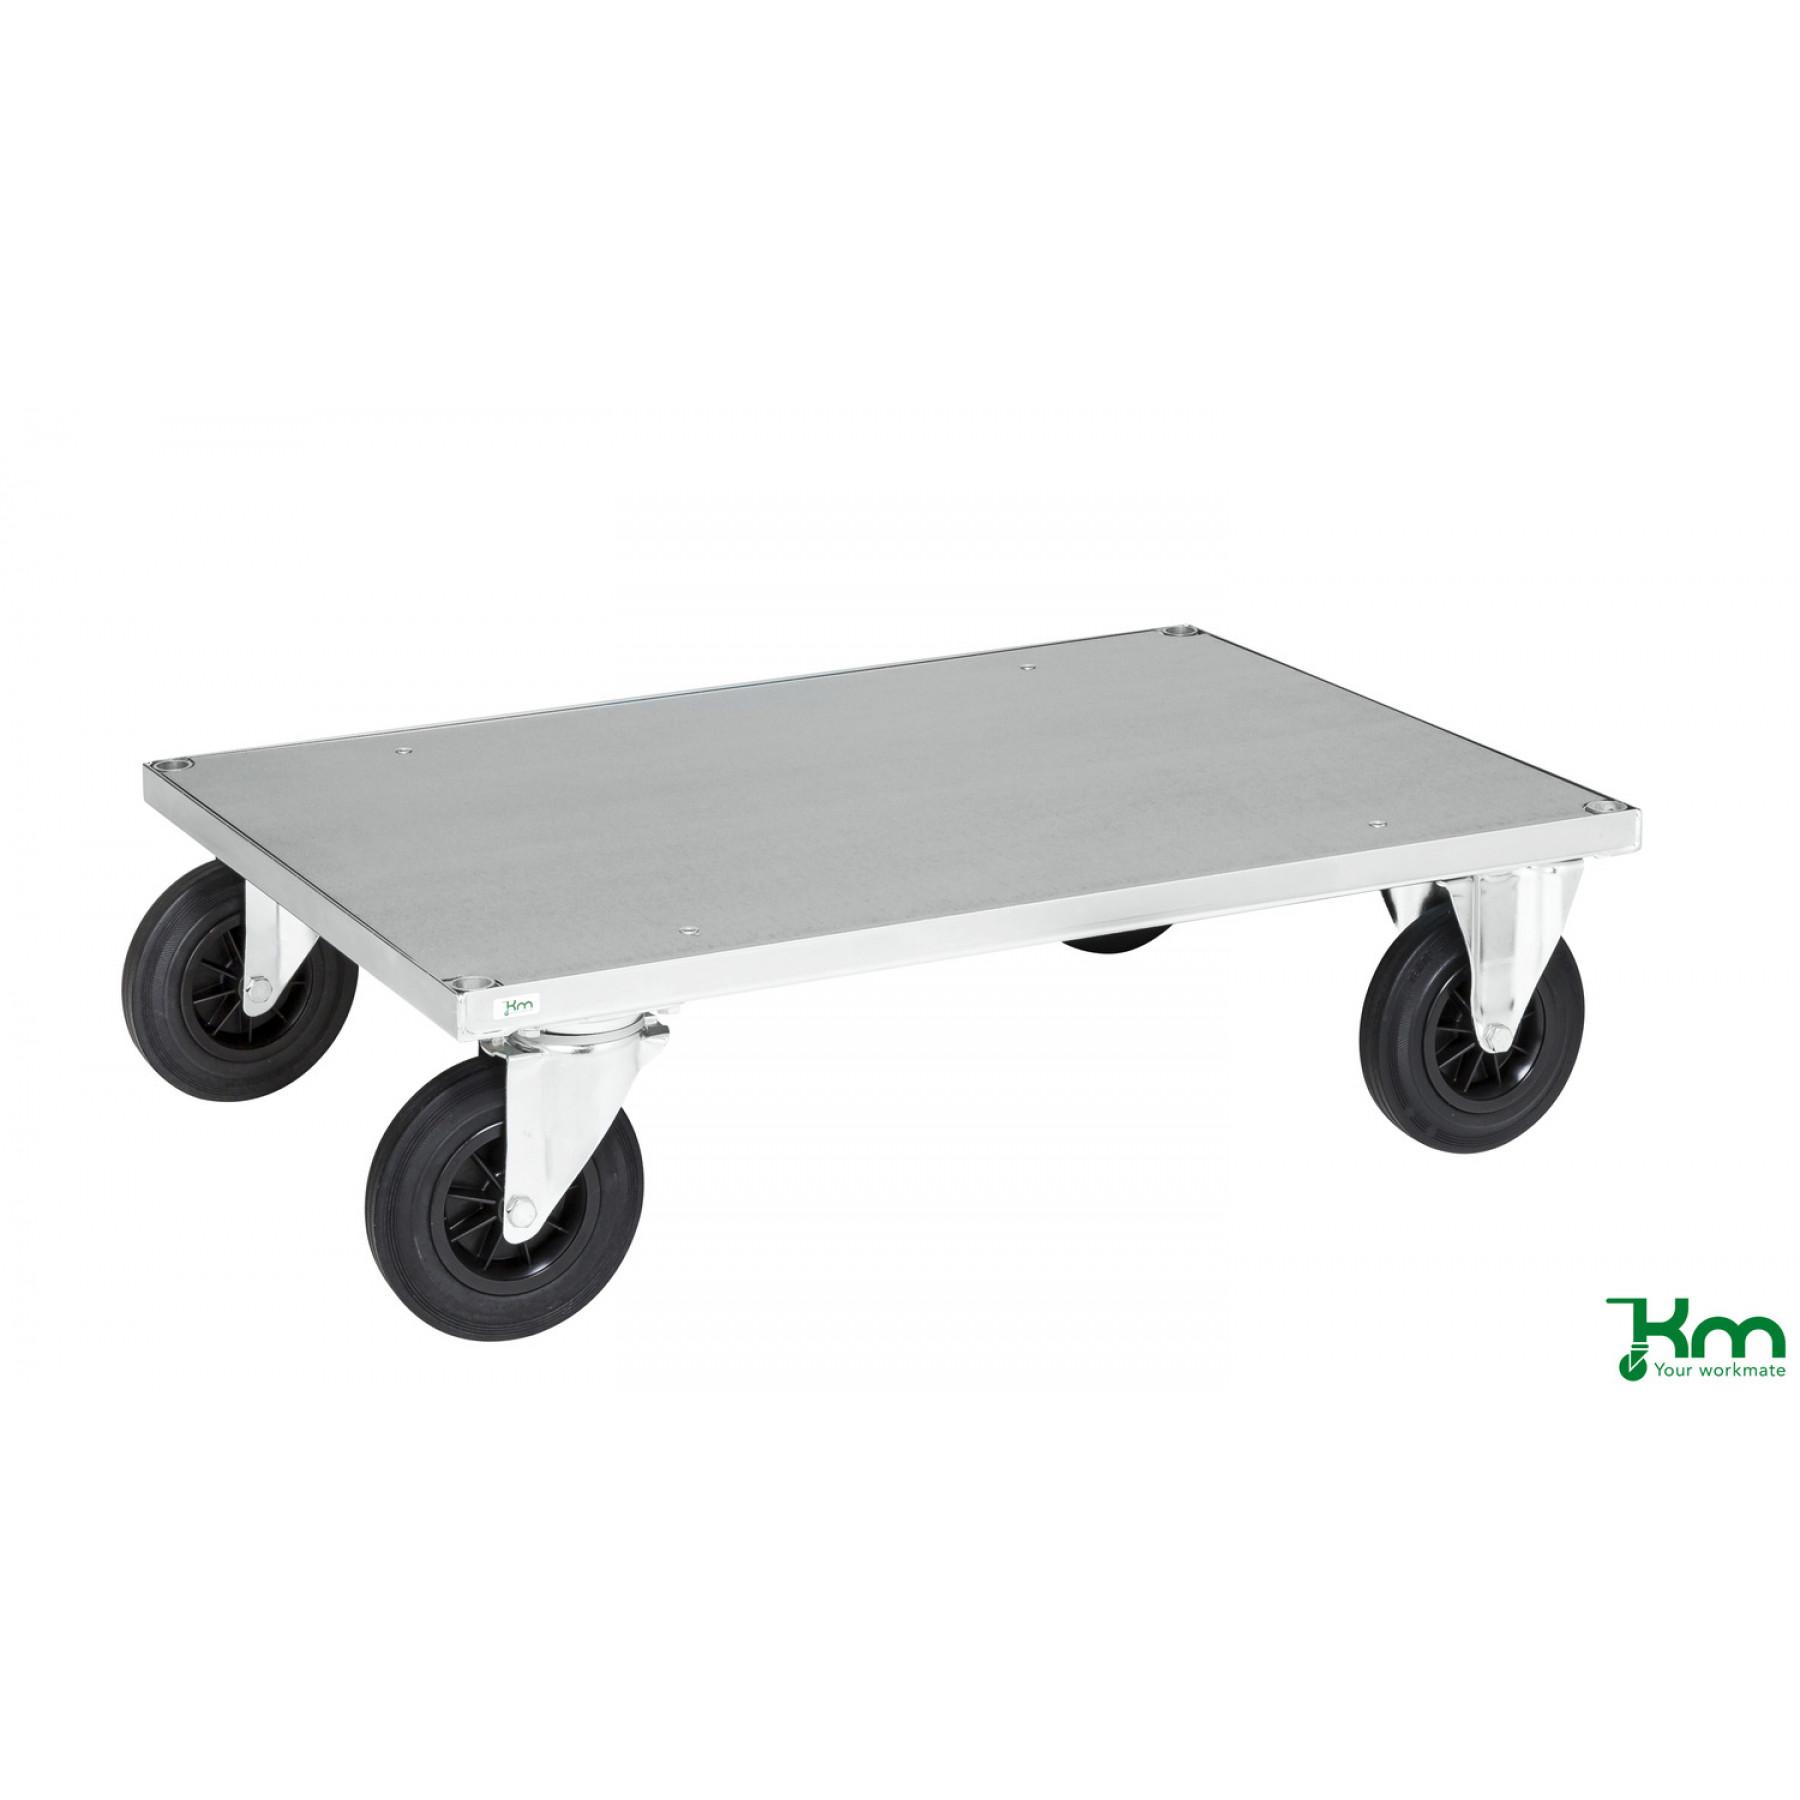 Platformwagen 1000x700 mm, KM 630-2B